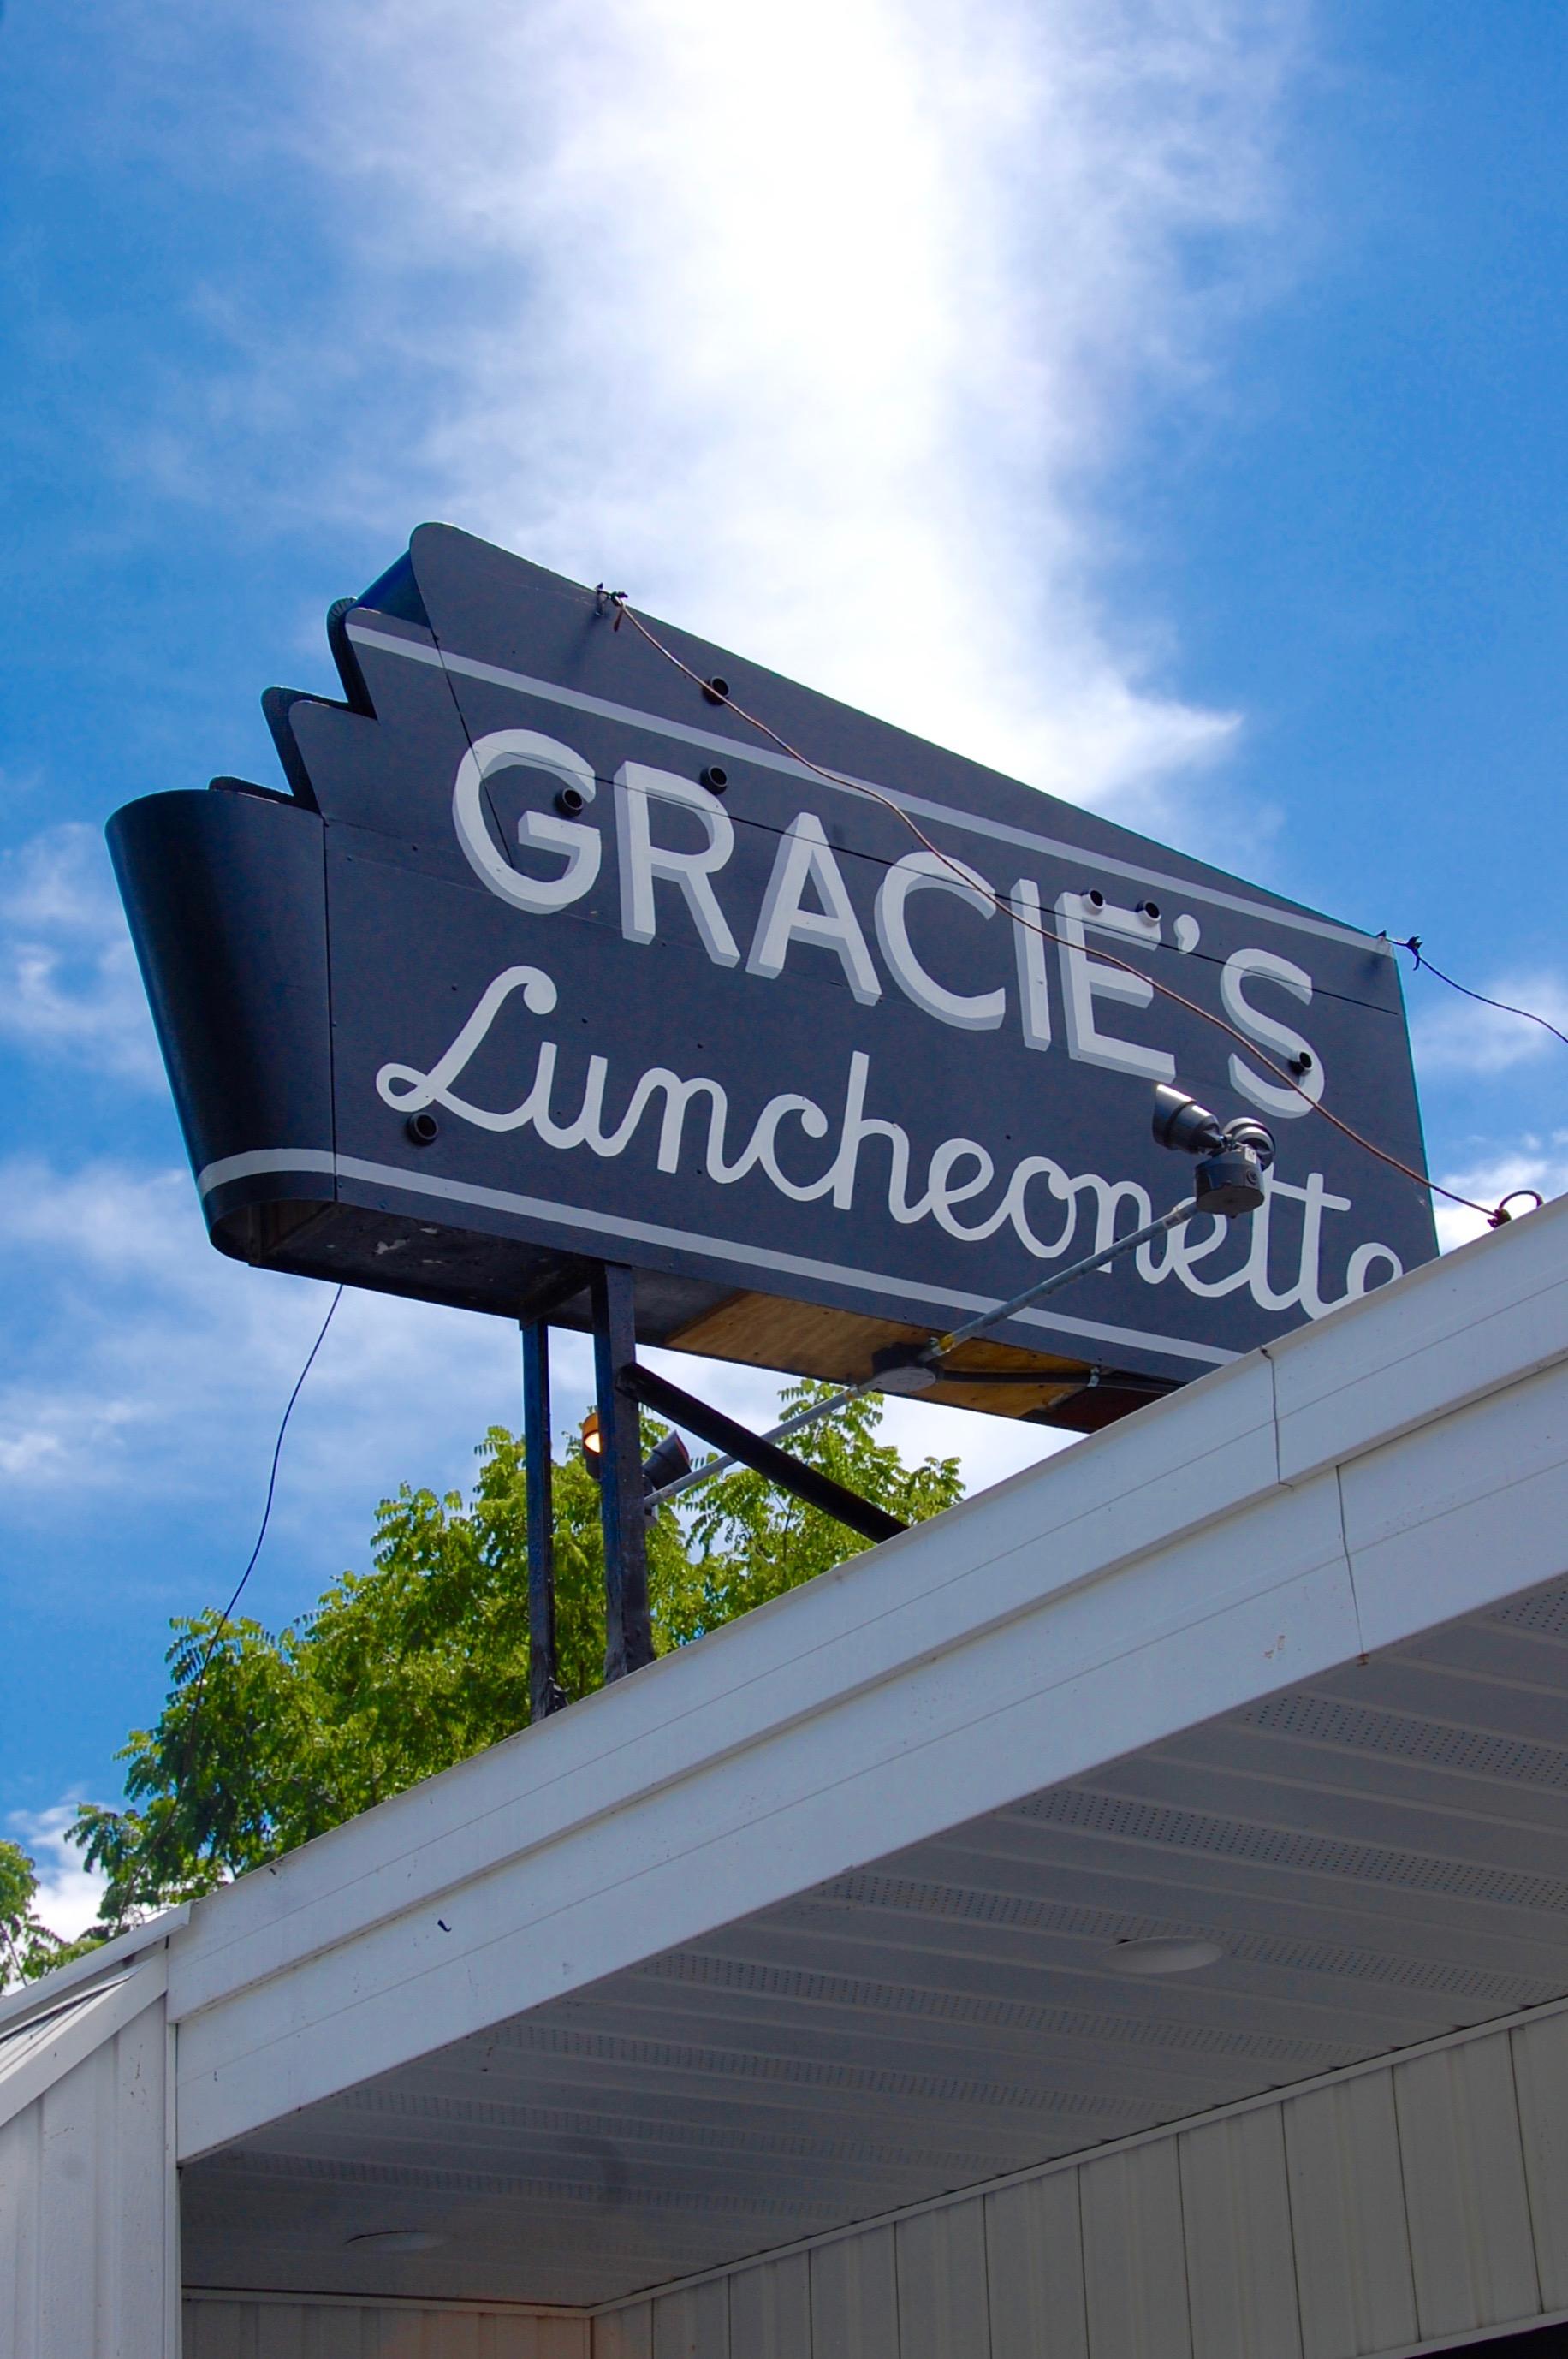 Gracie's Luncheonette